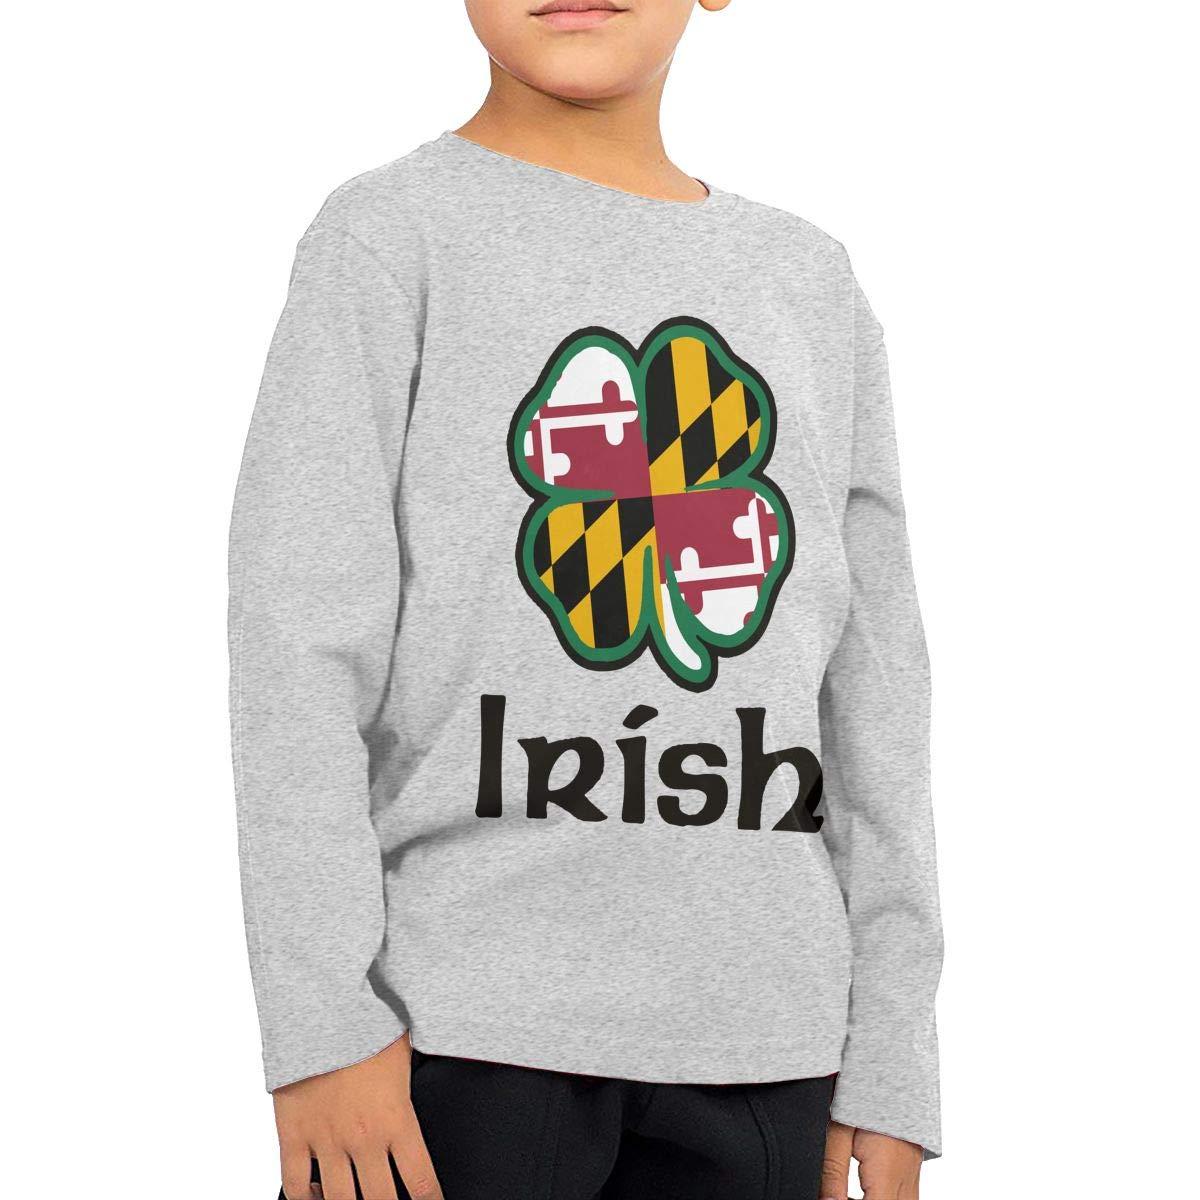 Fryhyu8 Toddler Childrens Maryland Flag Shamrock Irish-1 Printed Long Sleeve 100/% Cotton Infants T Shirts